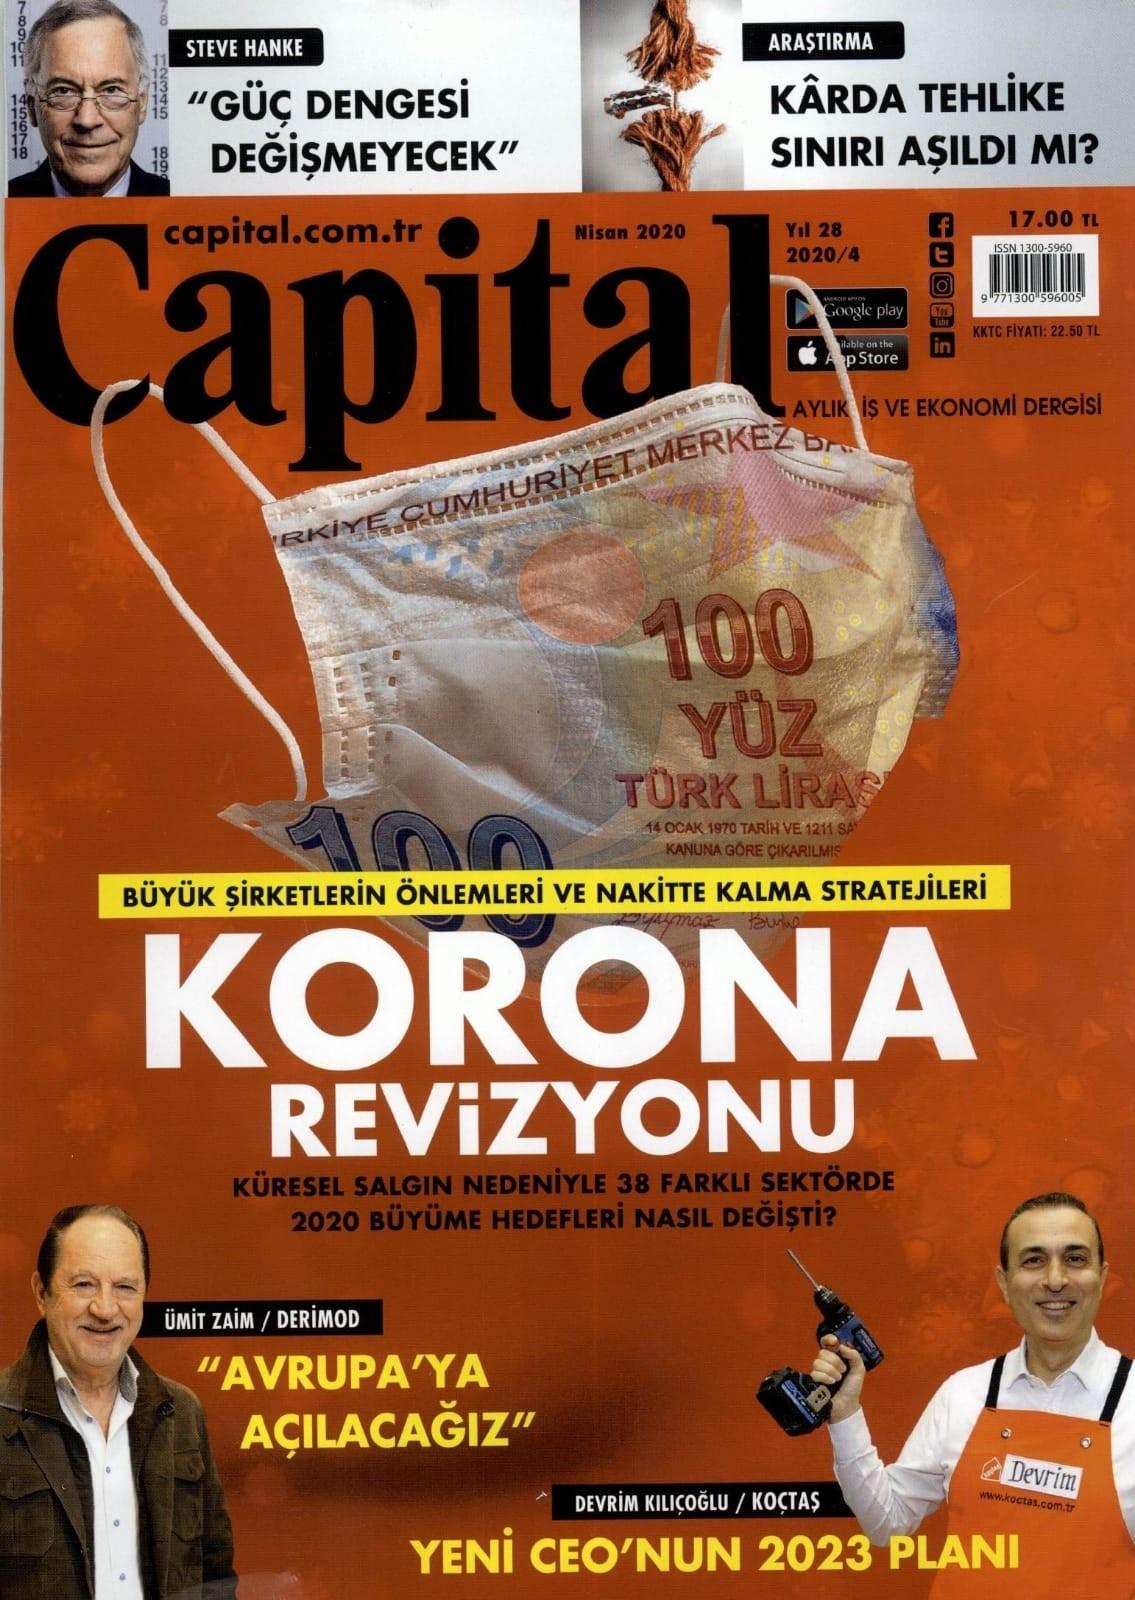 Zücder Capital Kapak 30.03.2020